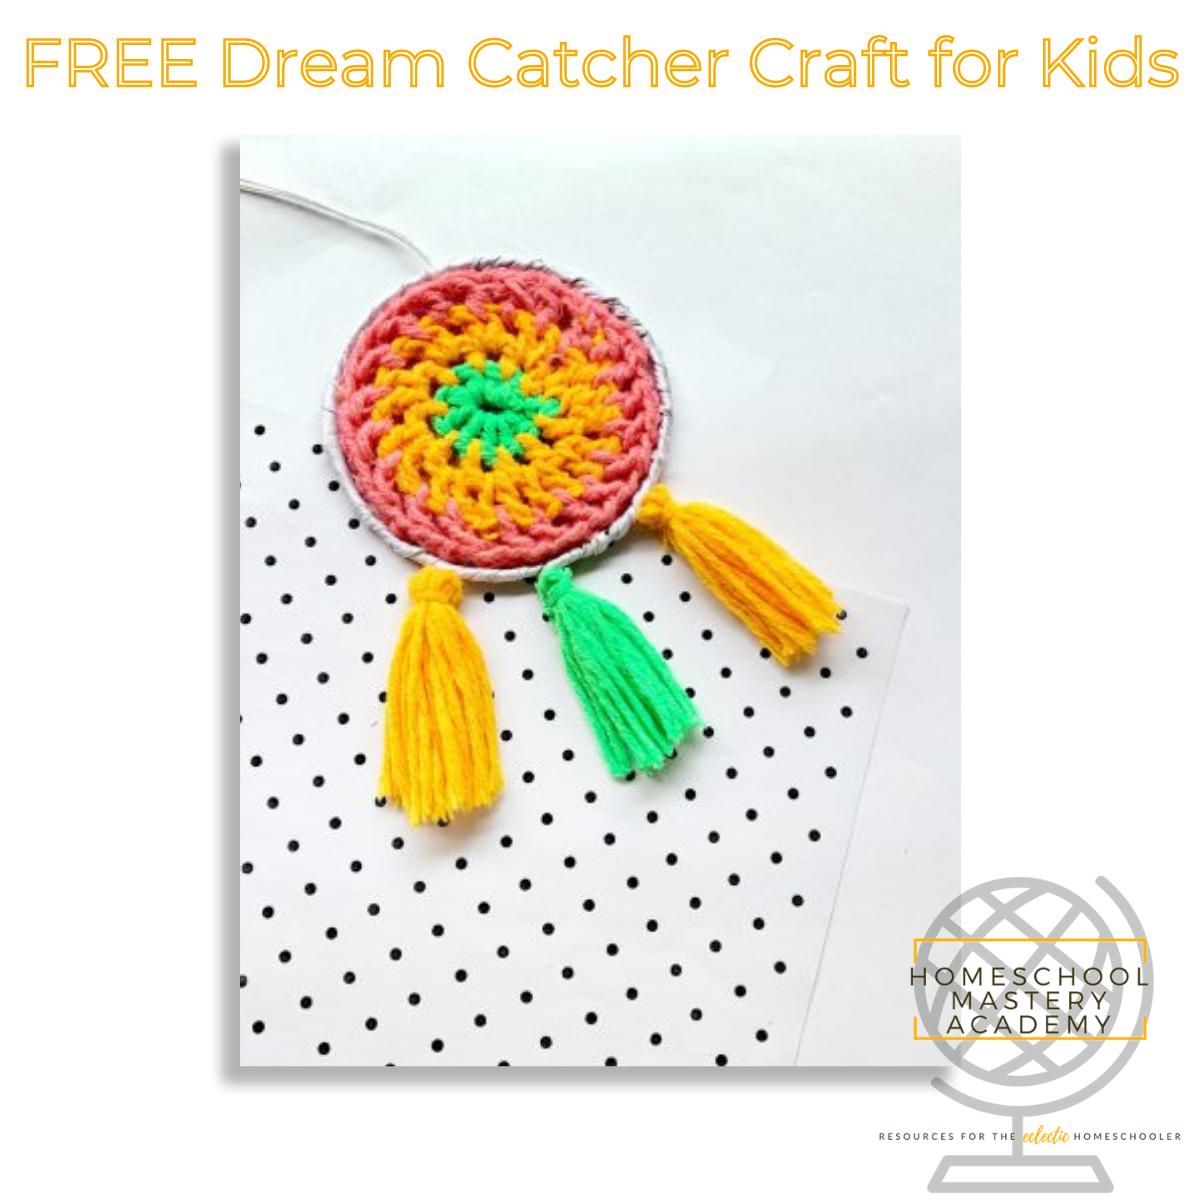 Dream Catcher Craft FREE